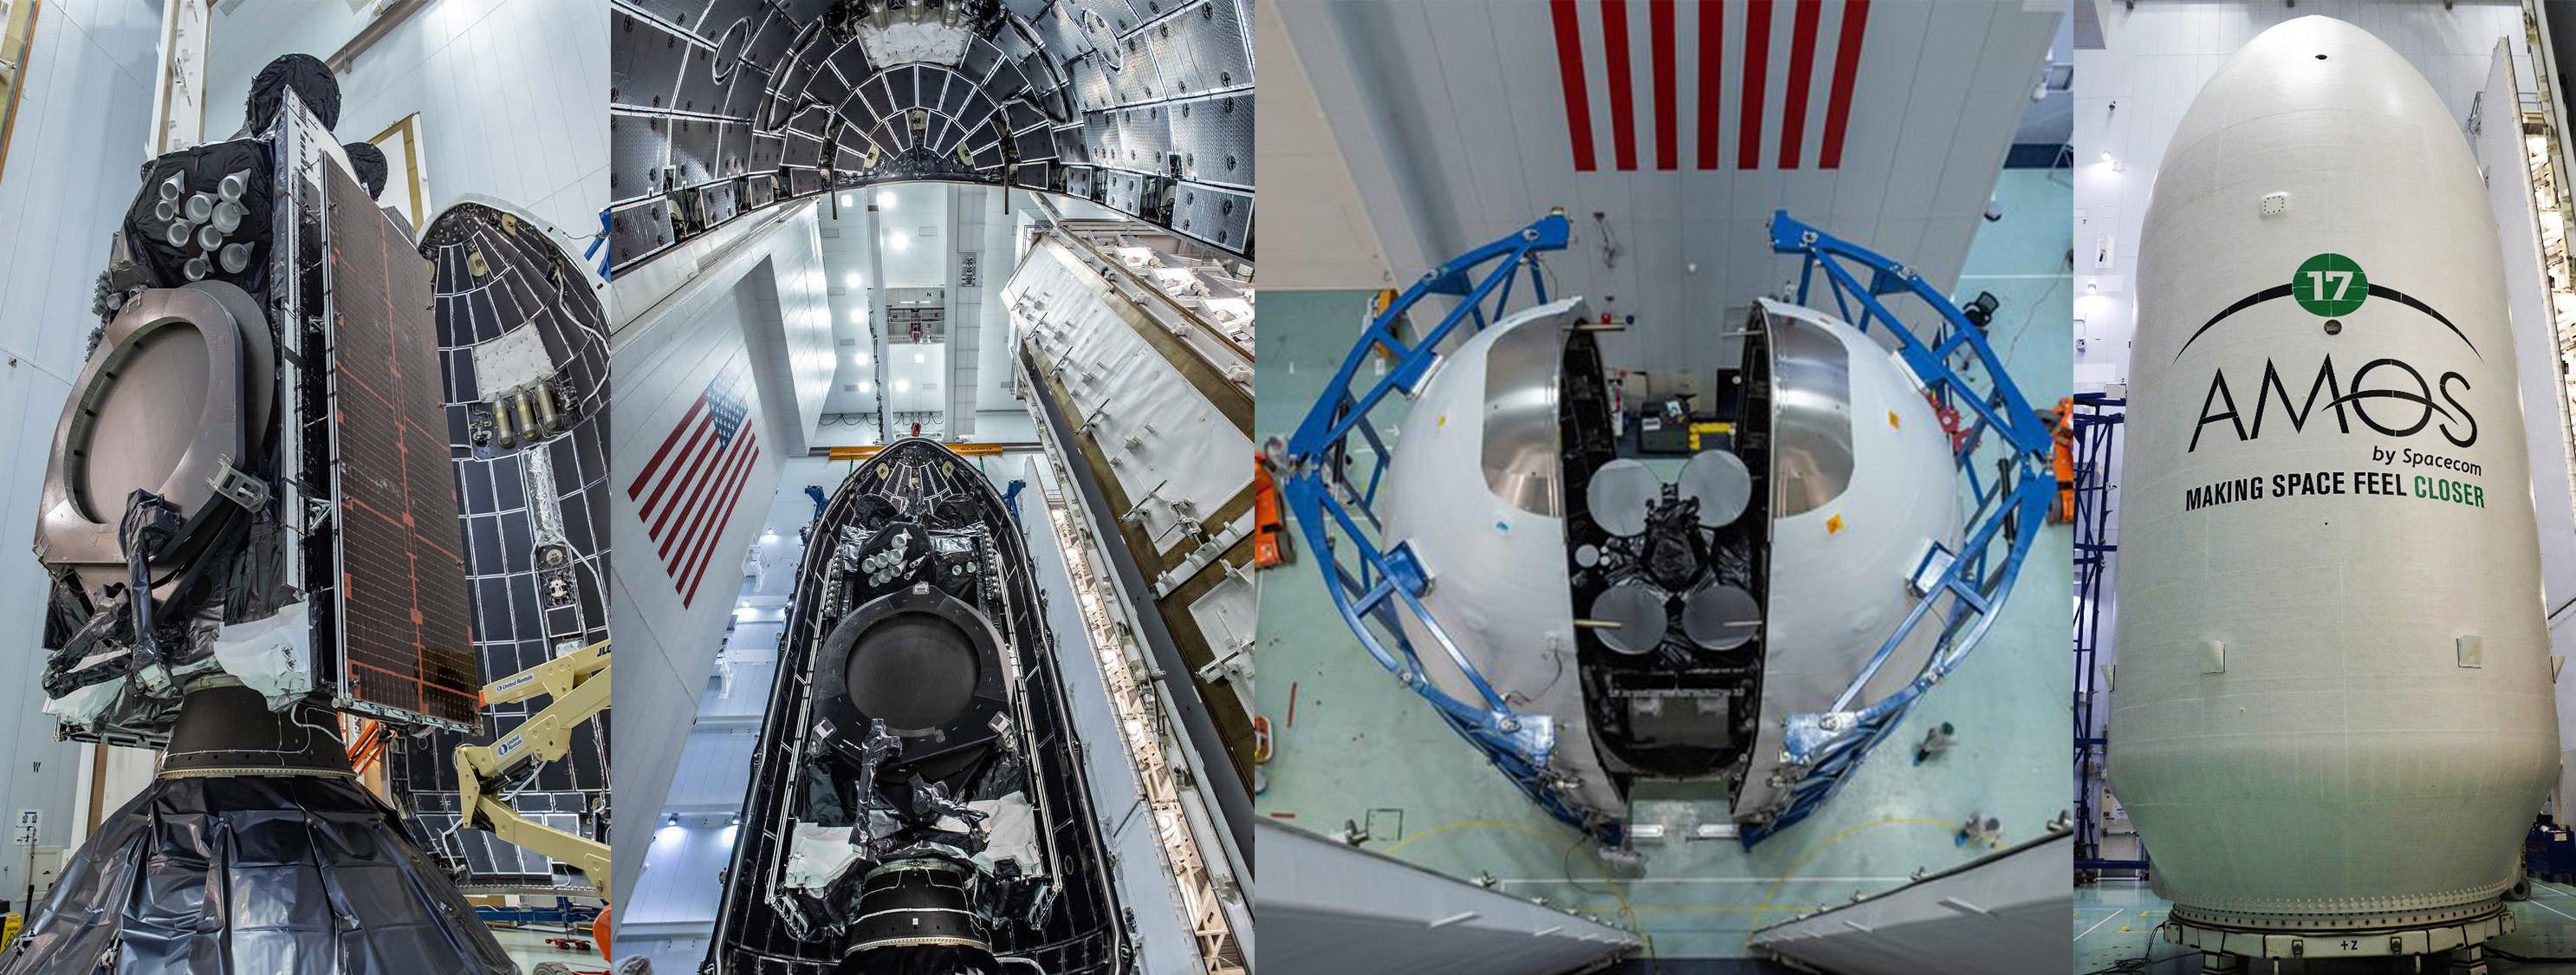 AMOS-17 Falcon 9 encapsulation (SpaceX) mosaic 1